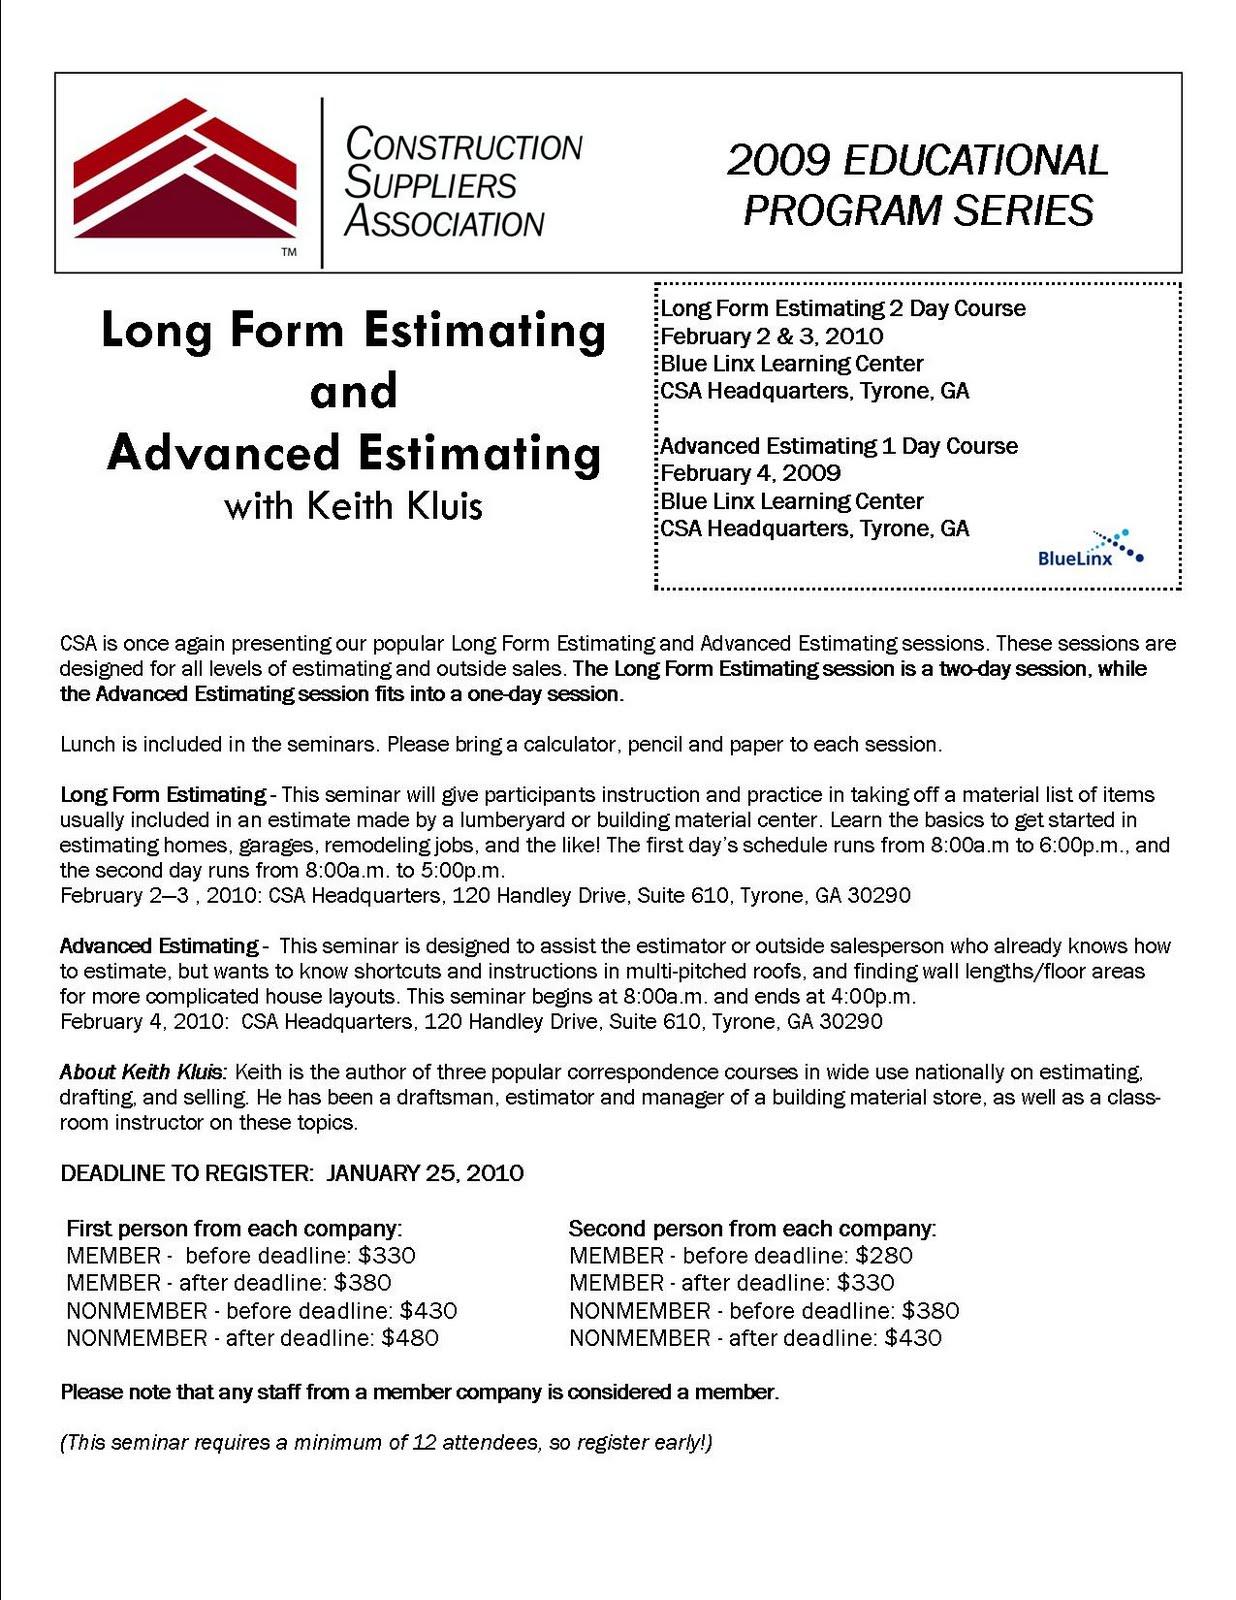 Building Strong Independent Dealers: Estimating Seminar: Register Now